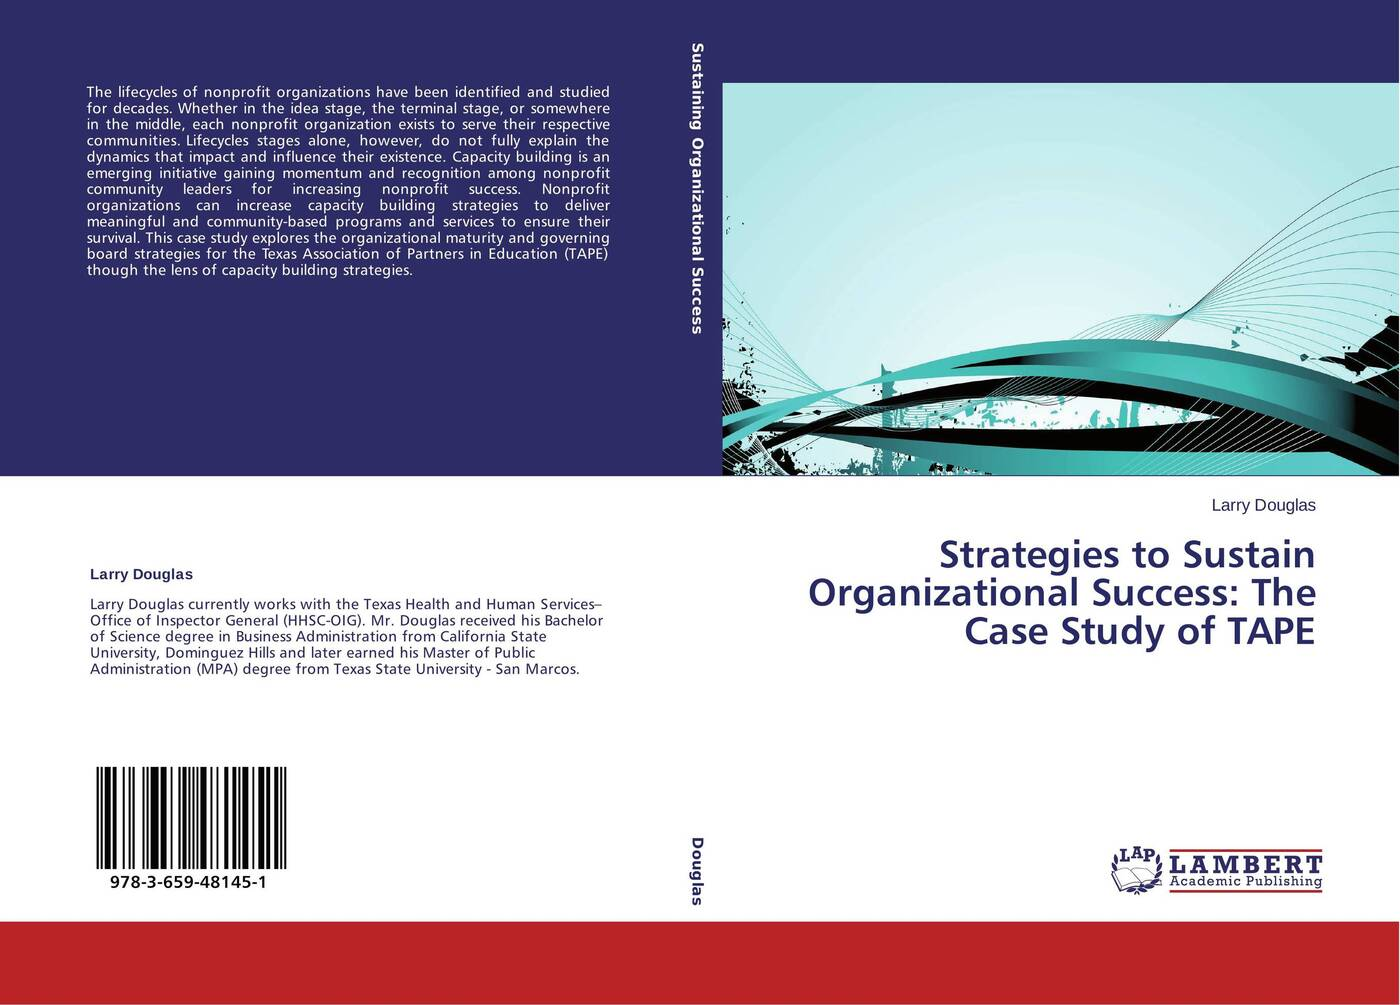 Larry Douglas Strategies to Sustain Organizational Success: The Case Study of TAPE susan raymond u nonprofit finance for hard times leadership strategies when economies falter